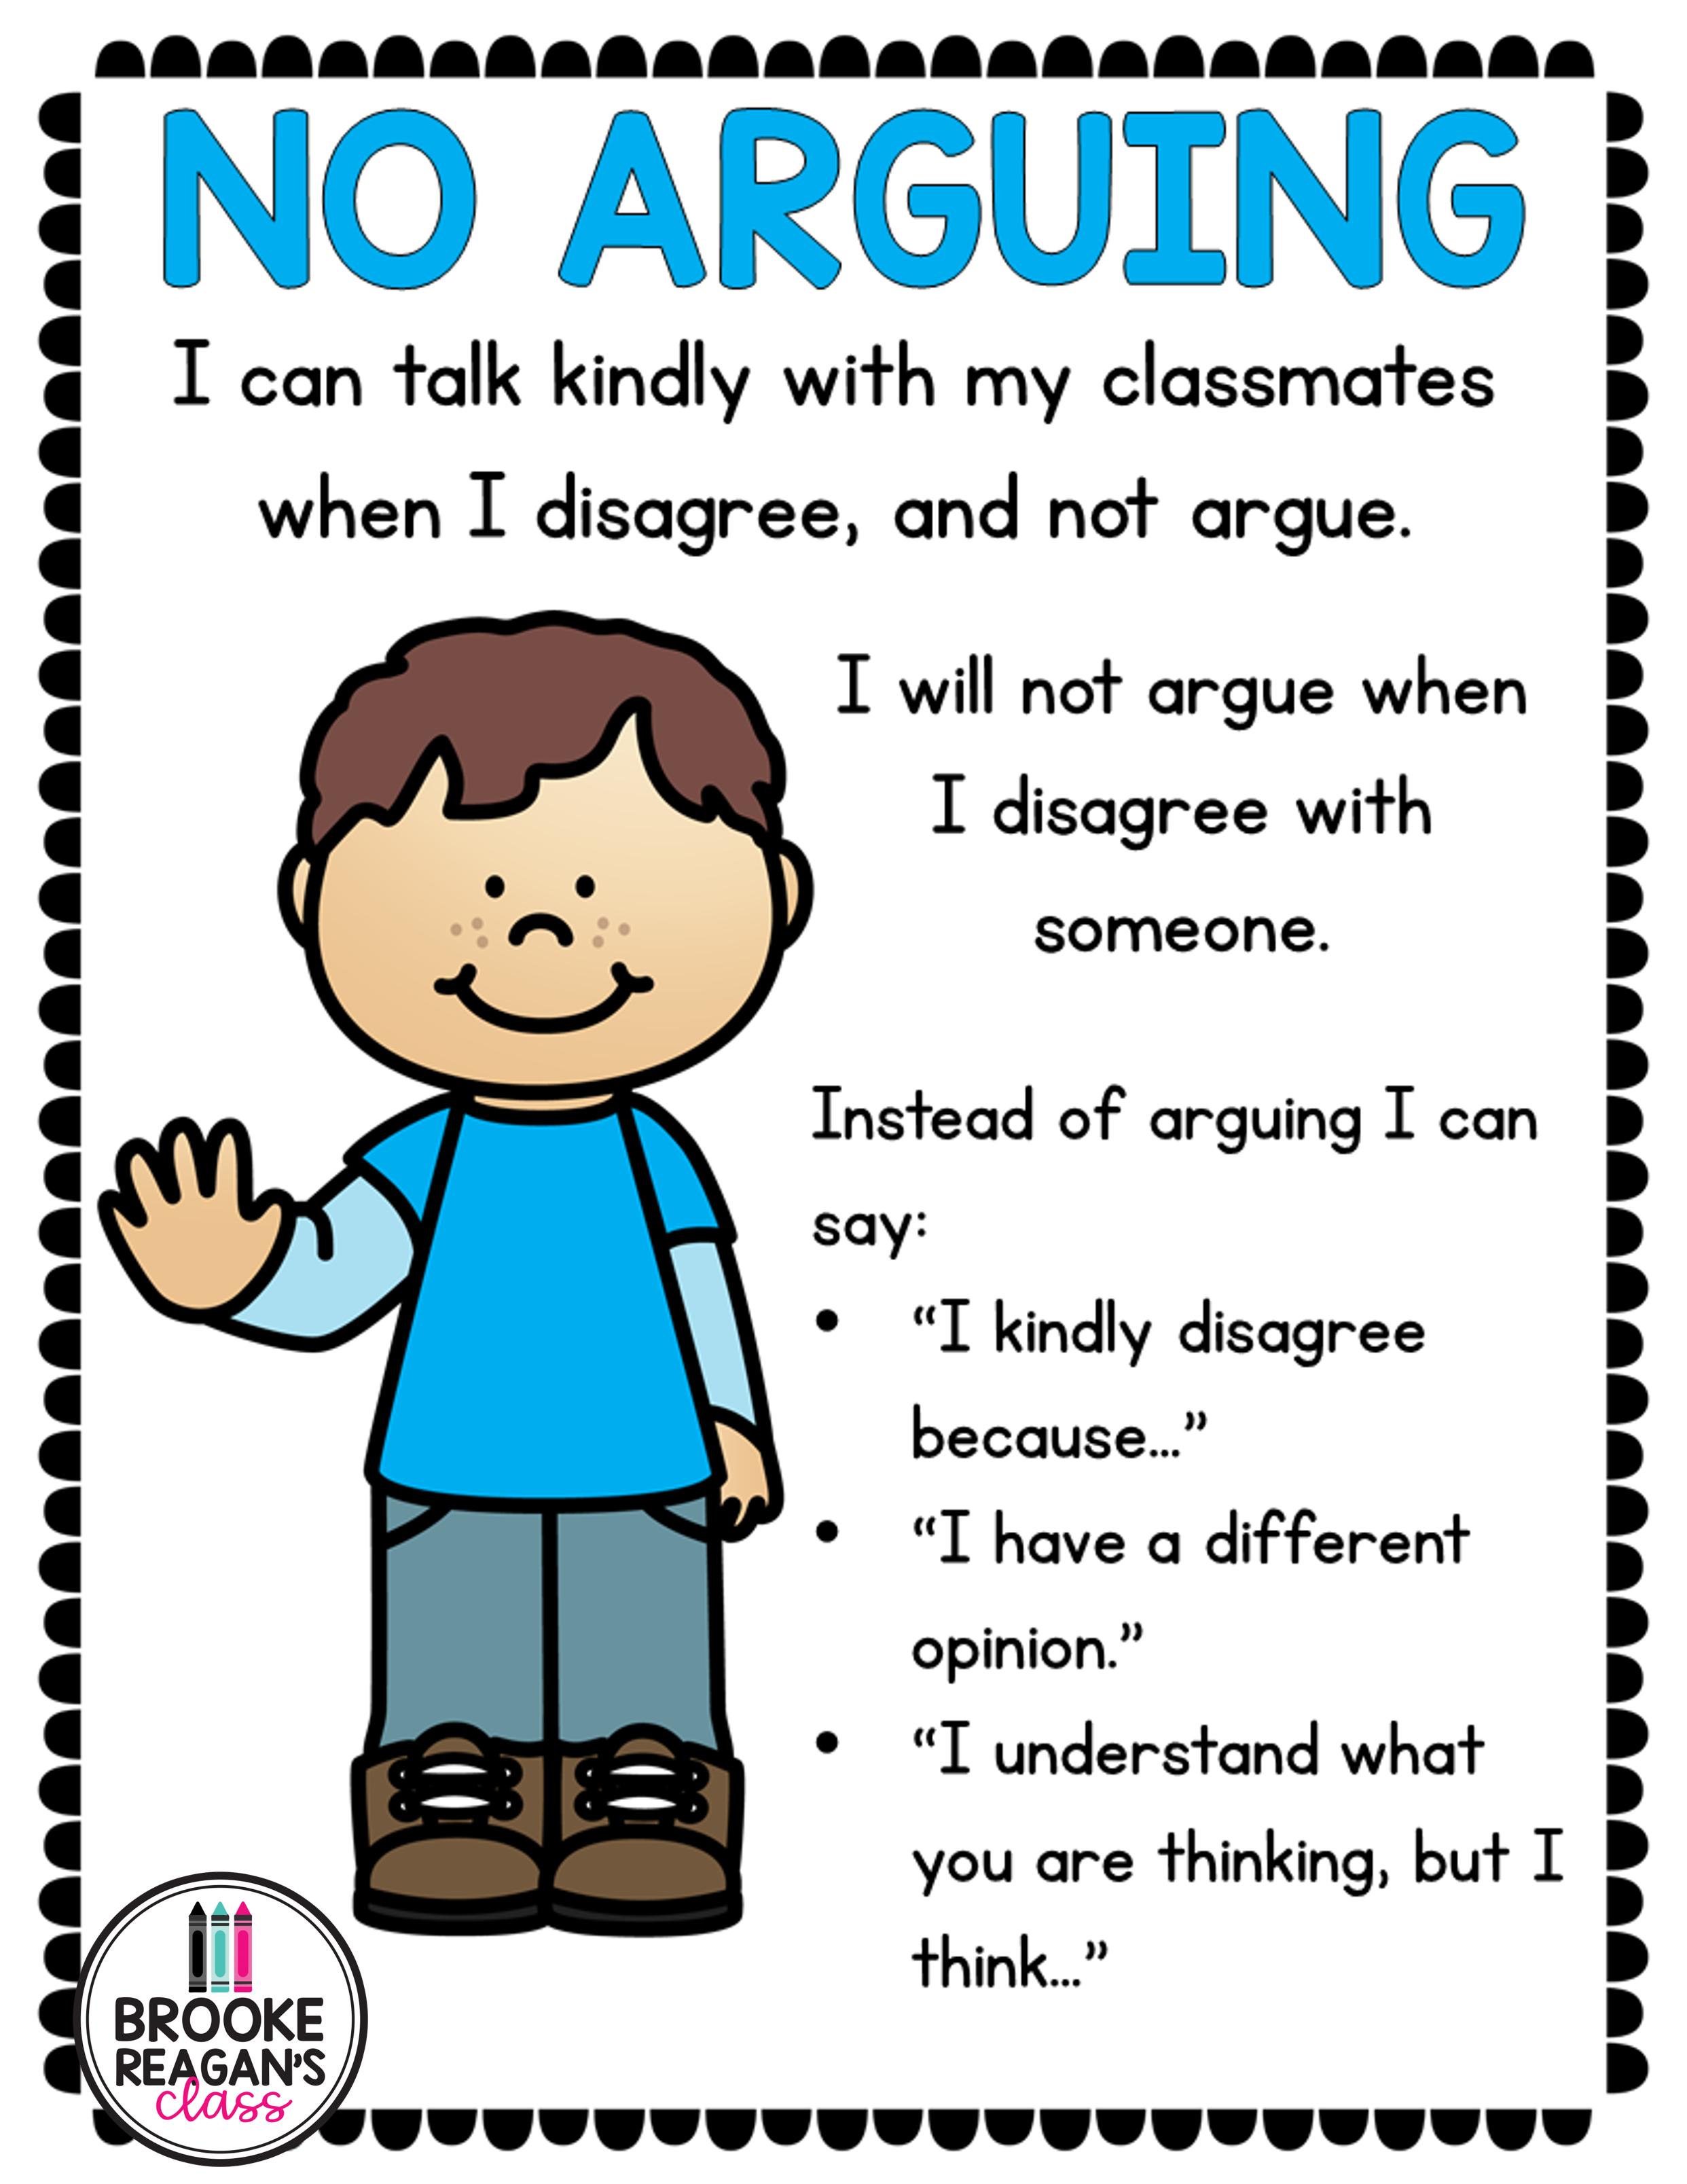 Social Skills Lesson Disagreeing Politely Social Skills Lessons Teaching Social Skills Social Emotional Skills